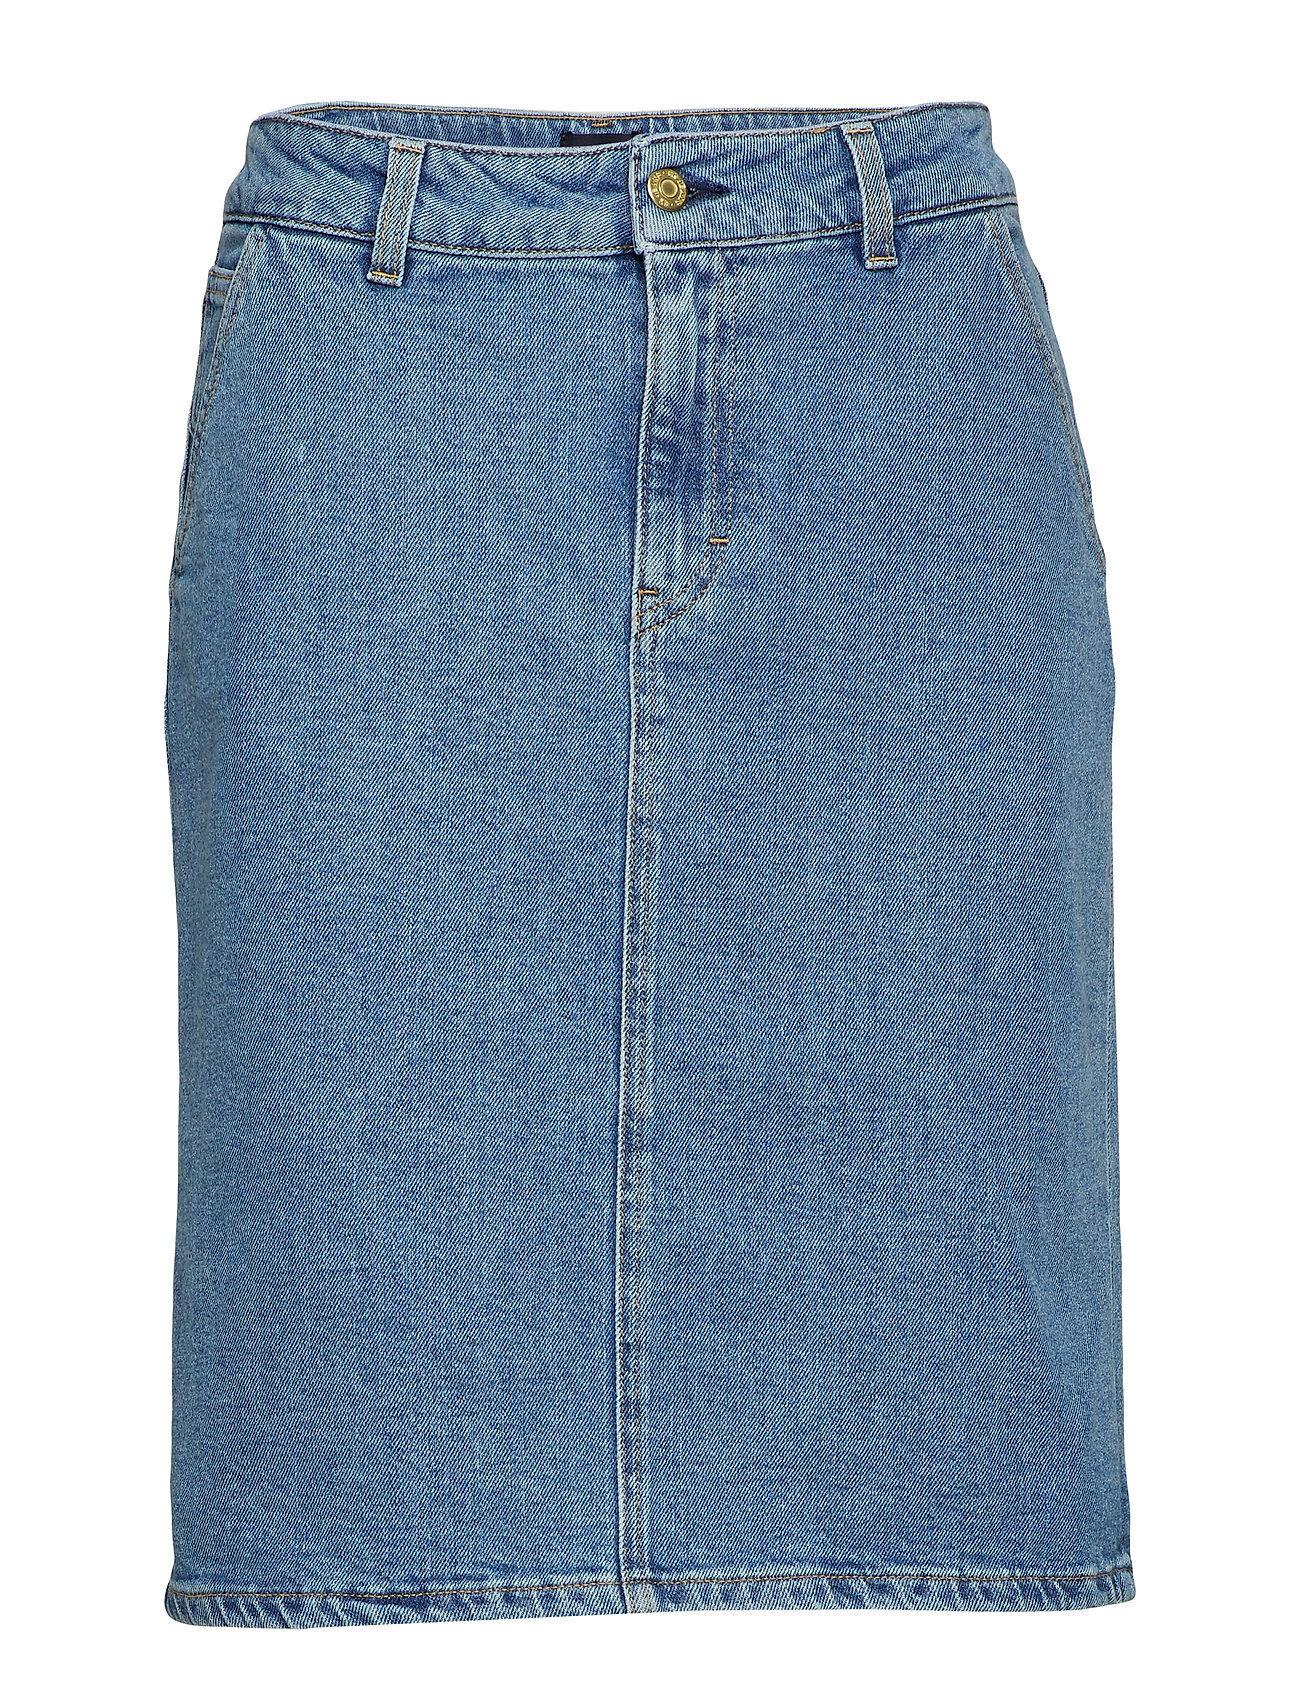 Filippa K Alicia Denim Skirt